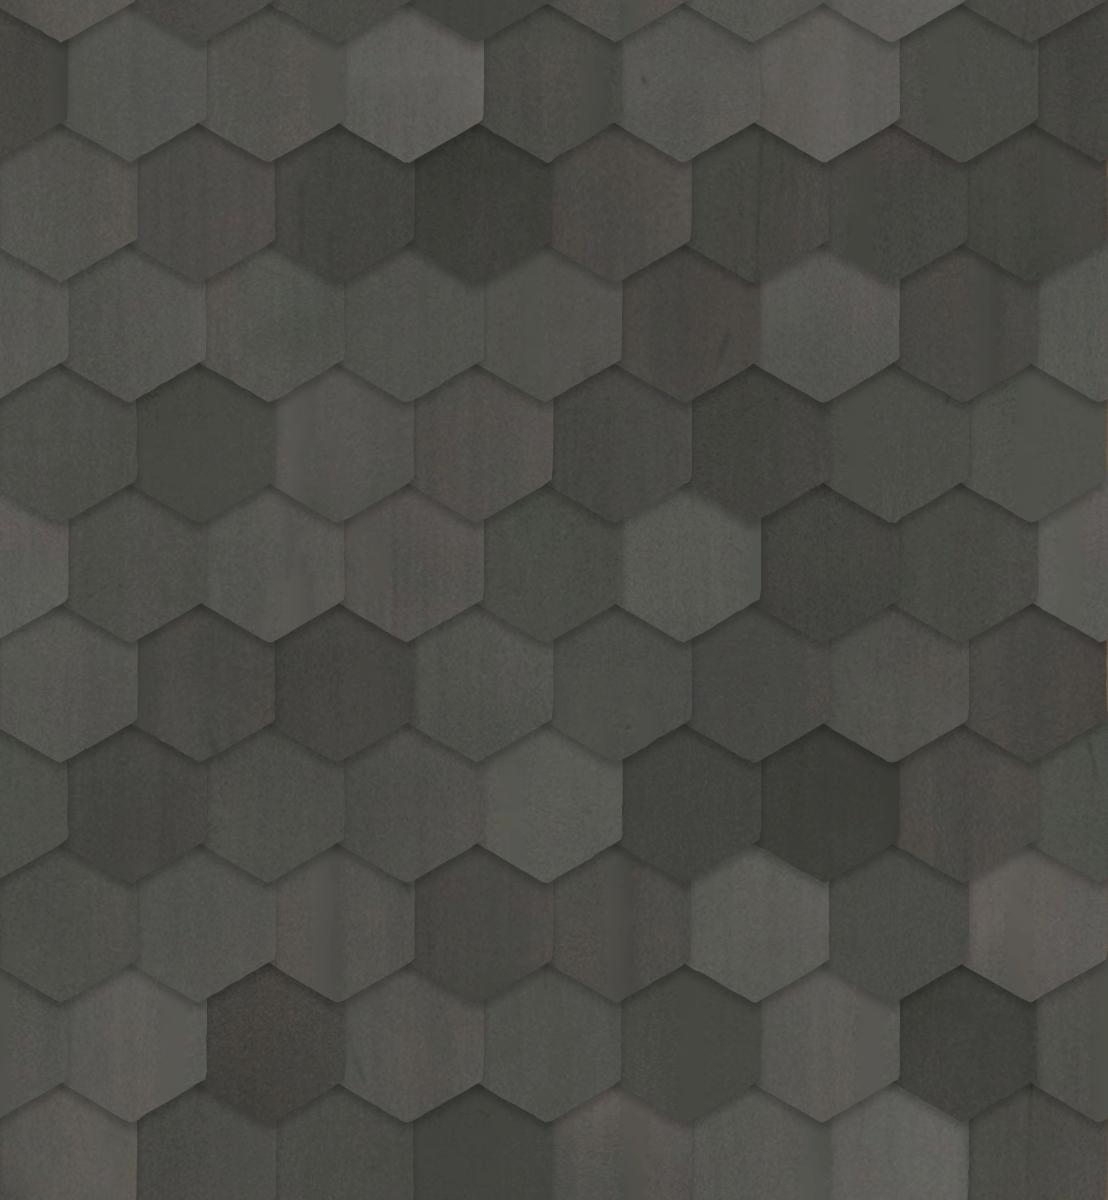 A seamless metal texture with zinc sheets arranged in a hexagonal pattern